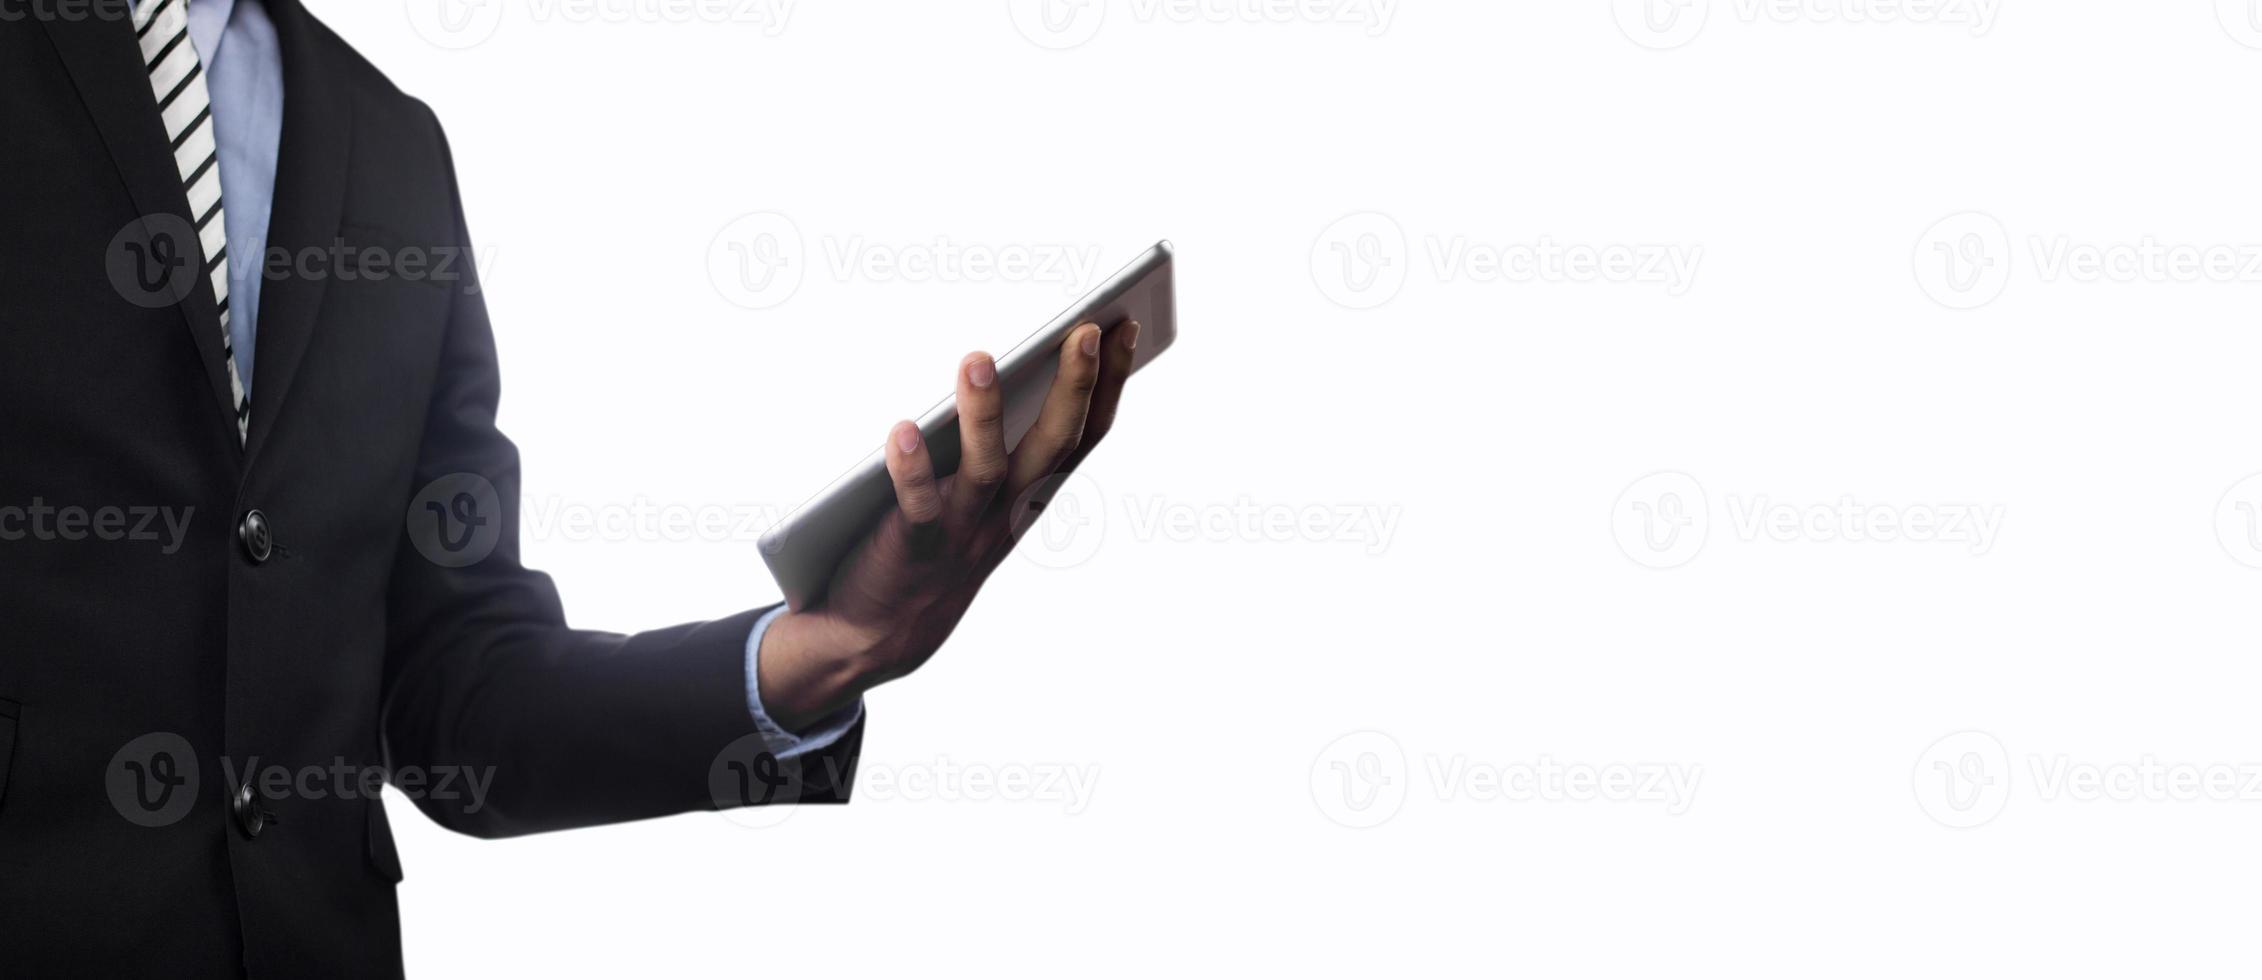 empresário segurando tablet isolado no fundo branco foto